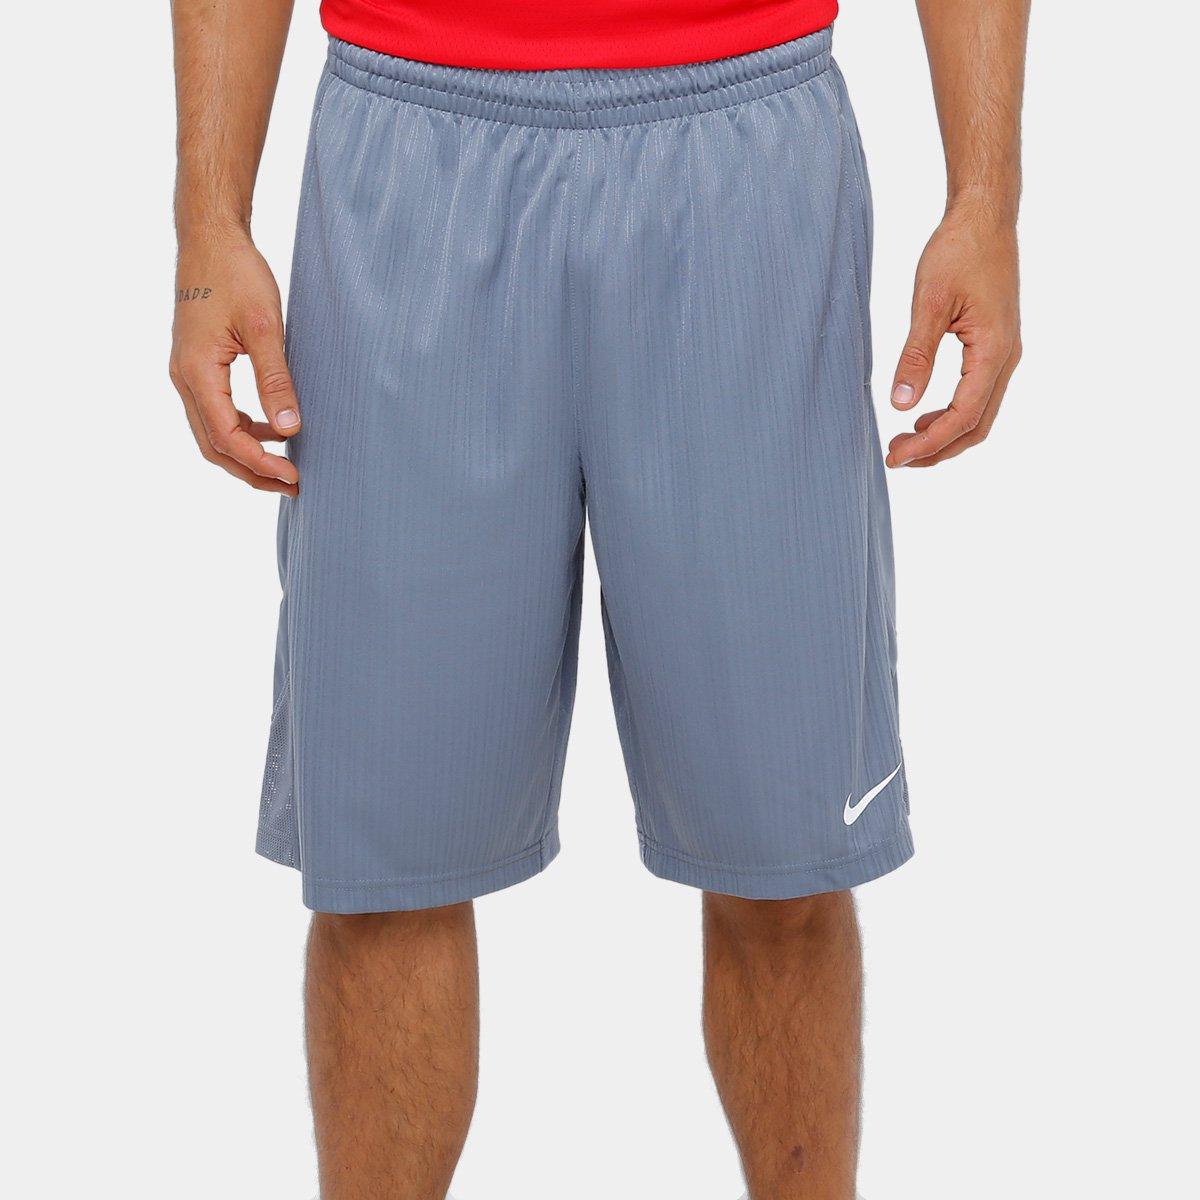 046f987f7f Bermuda Nike Layup 2.0 Masculina